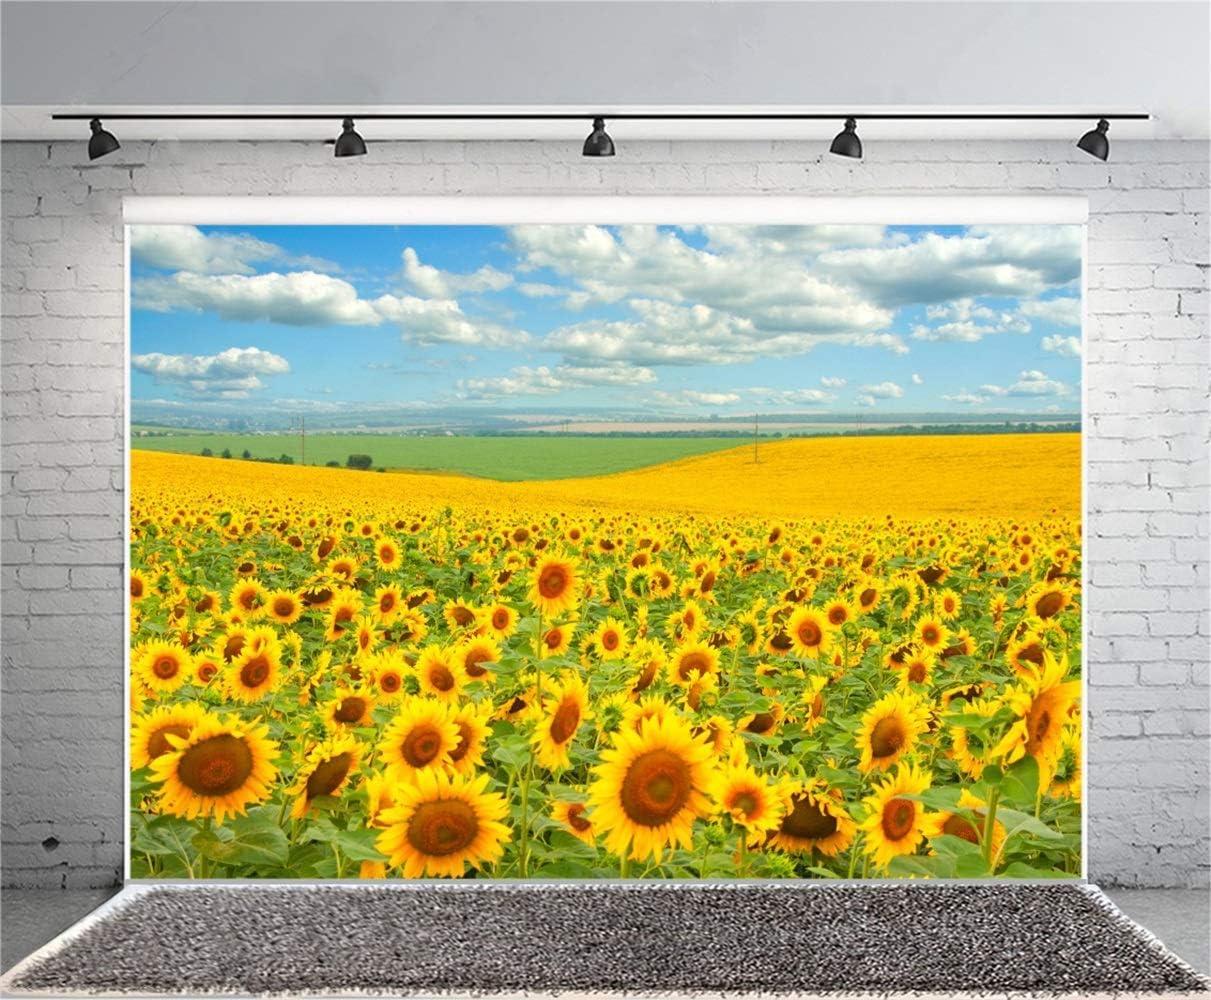 Endless Sunflower Field Scenic Backdrop 10x6.5ft Polyester Boundless Flower Field Grassland Blue Sky Cloud Photography Background Bride Groom Wedding Portrait Shoot Bride Shower Banner Wallpaper